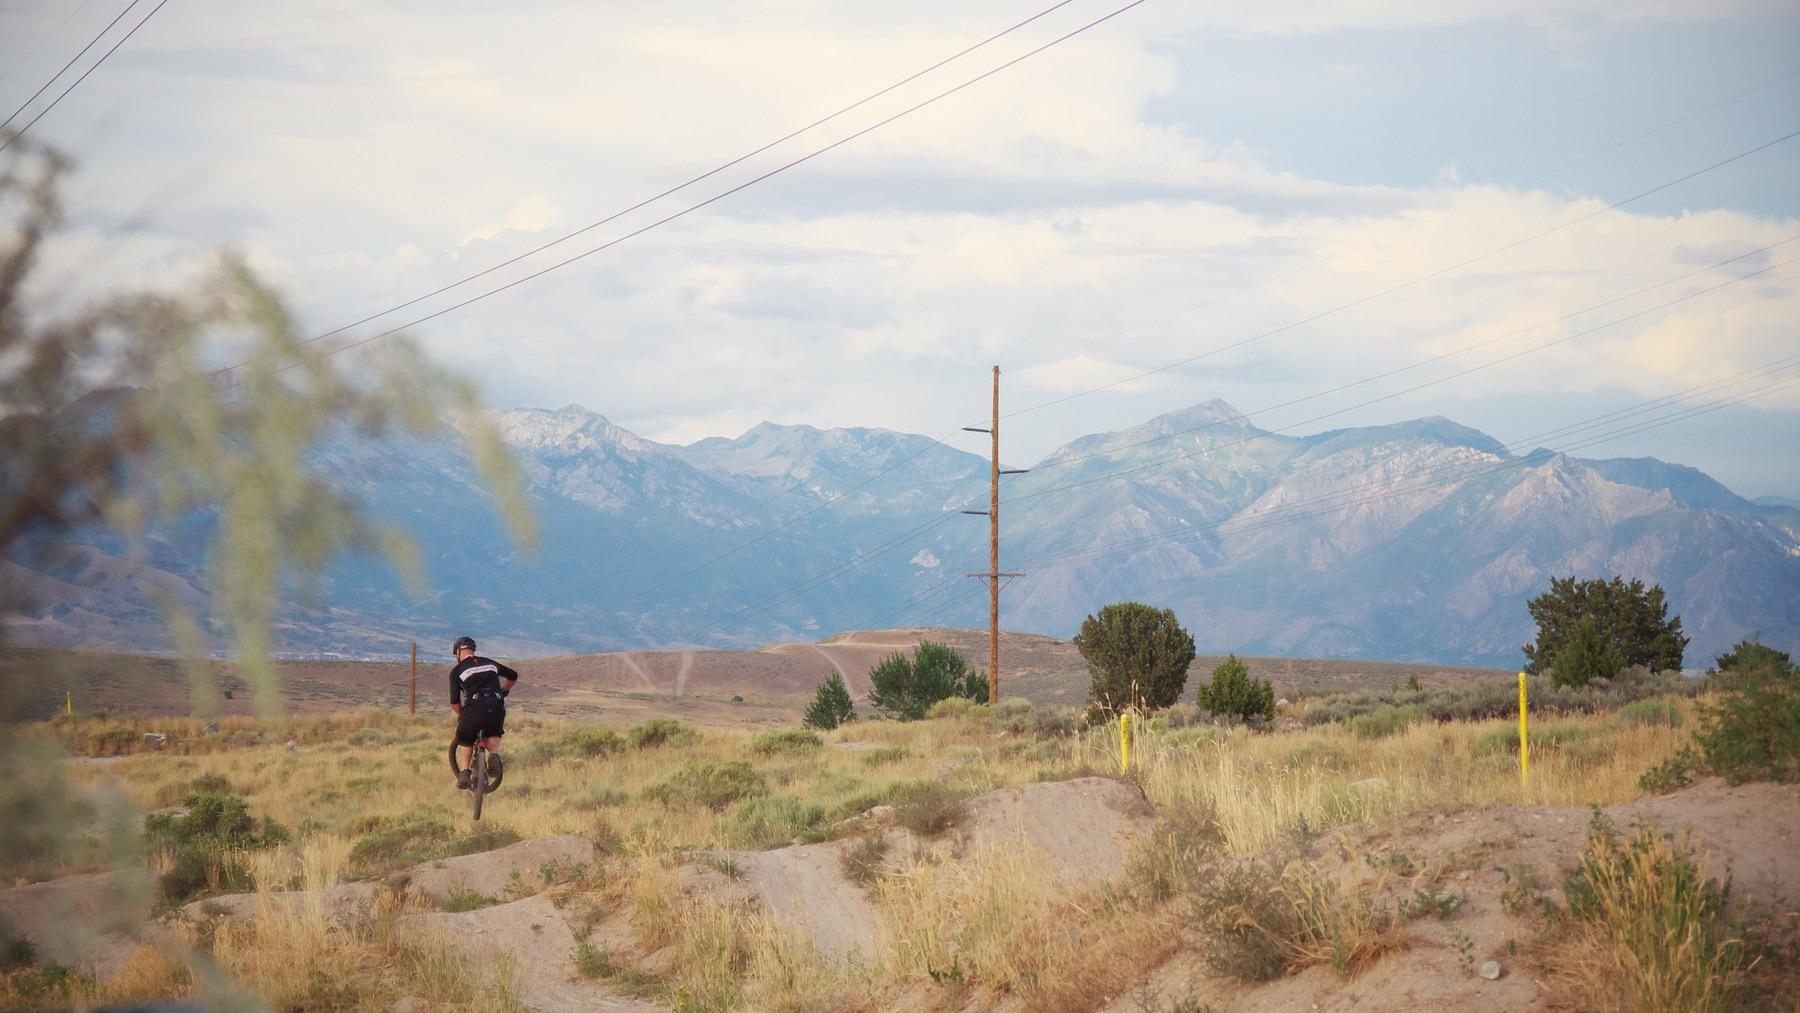 Salt Lake City's 17 Best Mountain Bike Rides - Outdoor Project